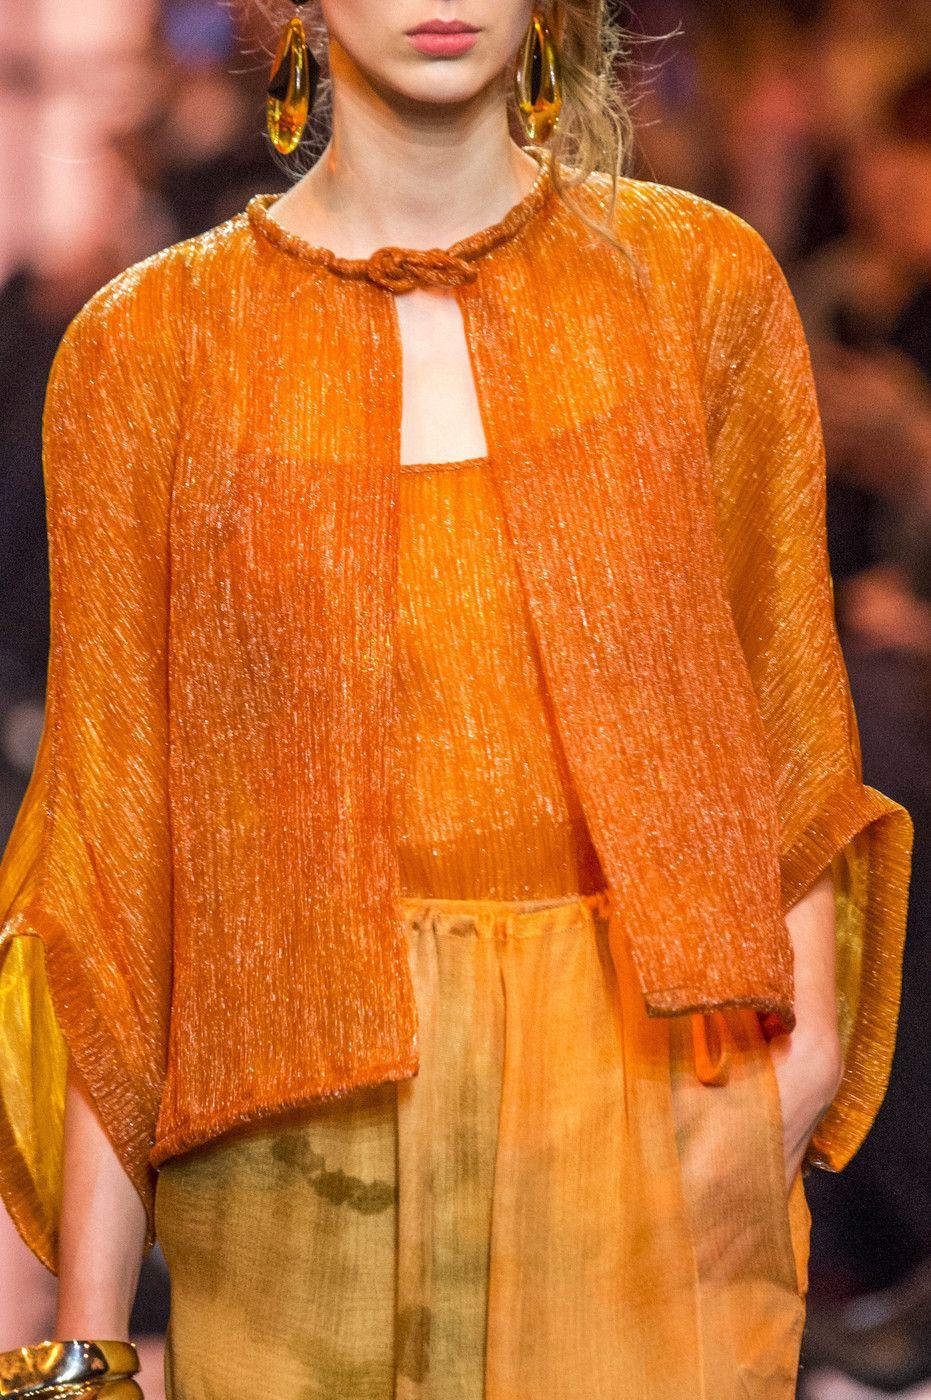 Armani Privé at Couture Spring 2017 (Details)